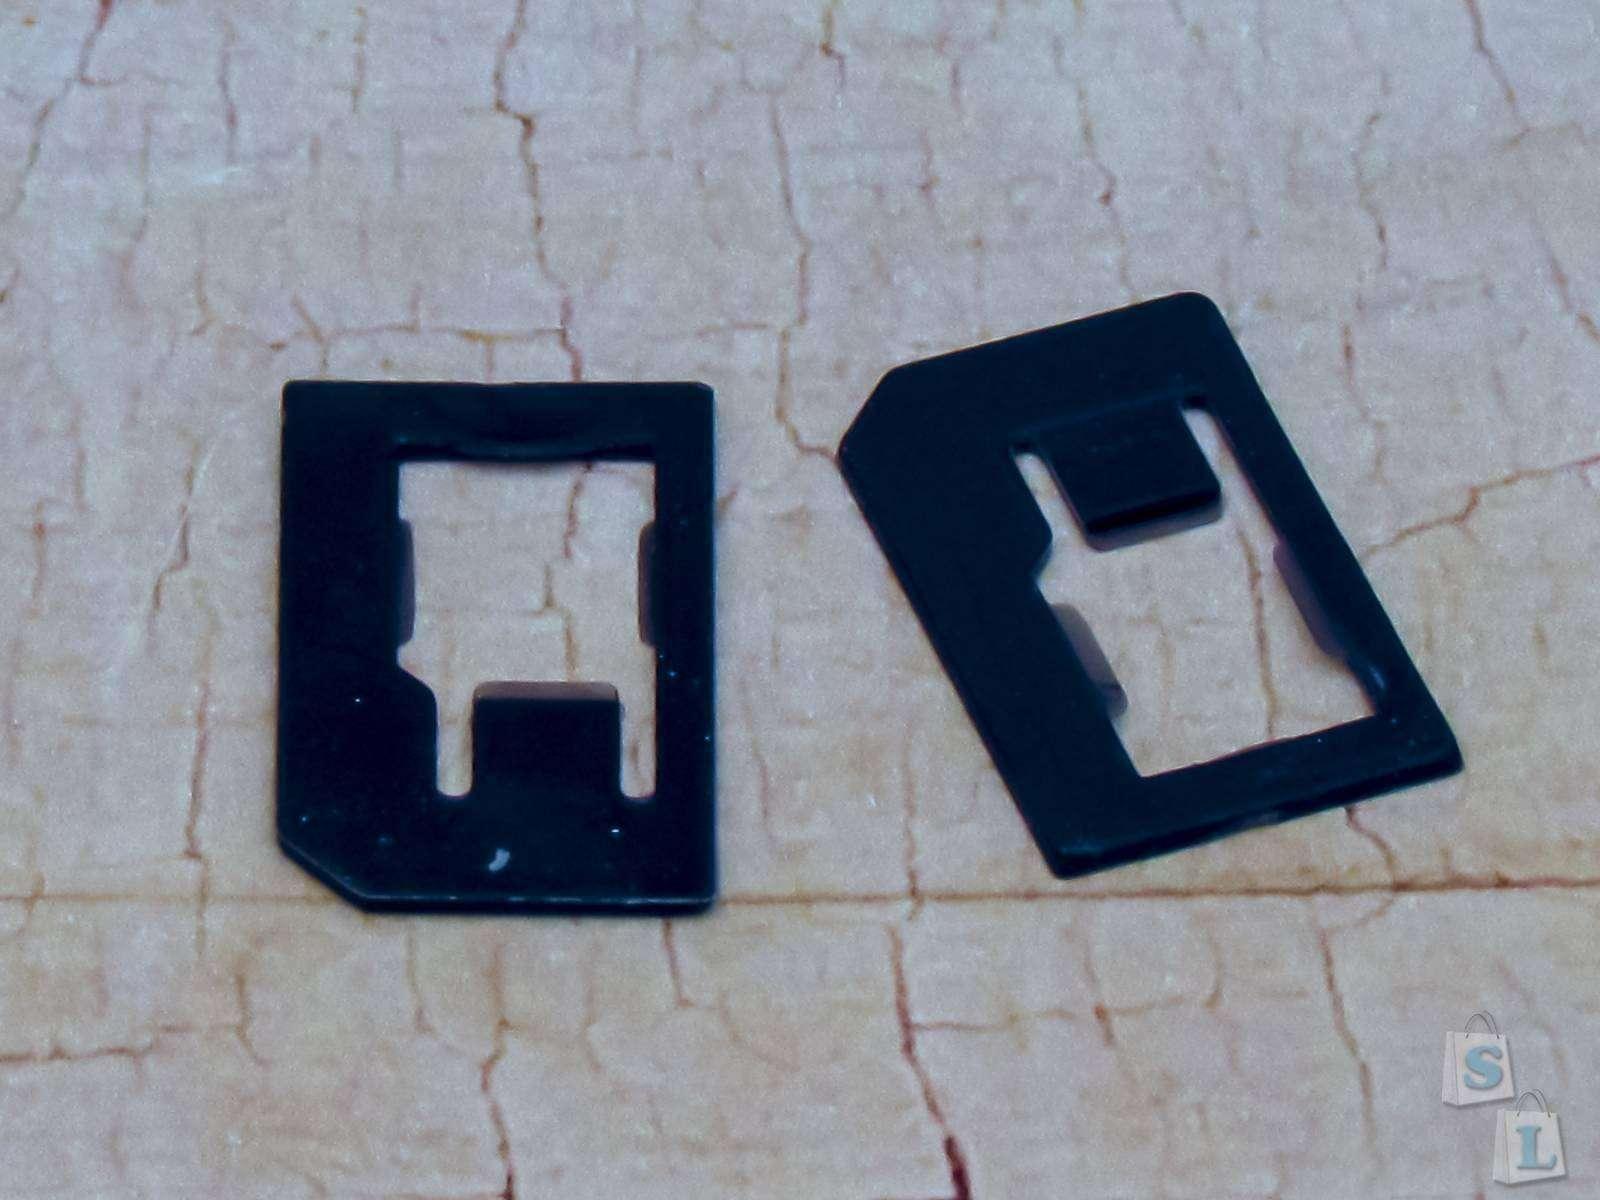 GearBest: Обрезатель для Sim карт в Nano Sim